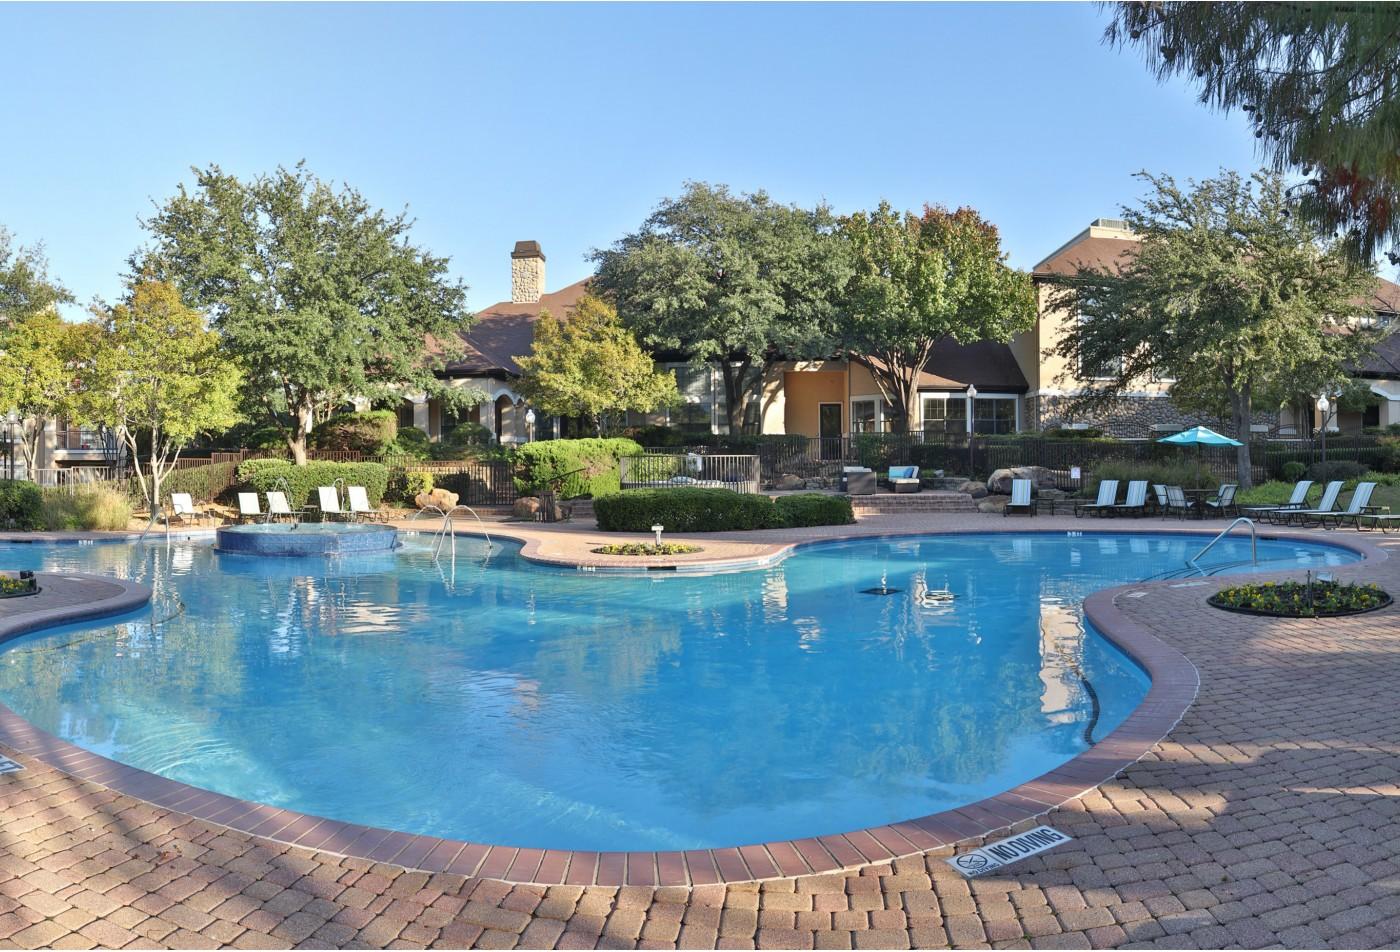 swimming pool apartment community